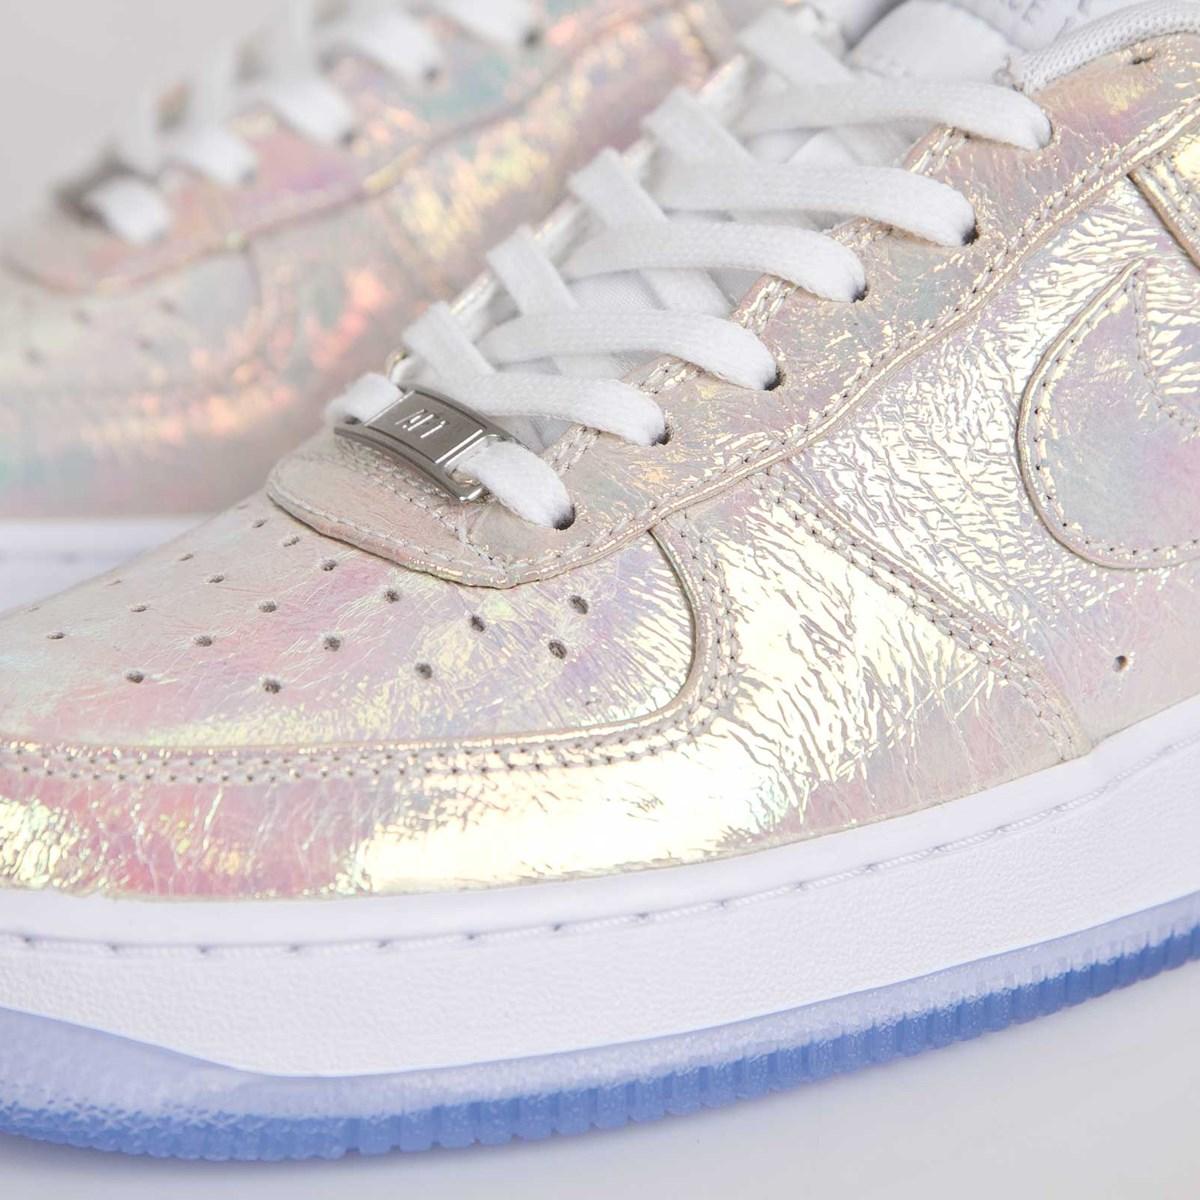 promo code ae1b8 5e043 ... promo code for nike wmns air force 1 07 premium qs 704517 100  sneakersnstuff sneakers streetwear